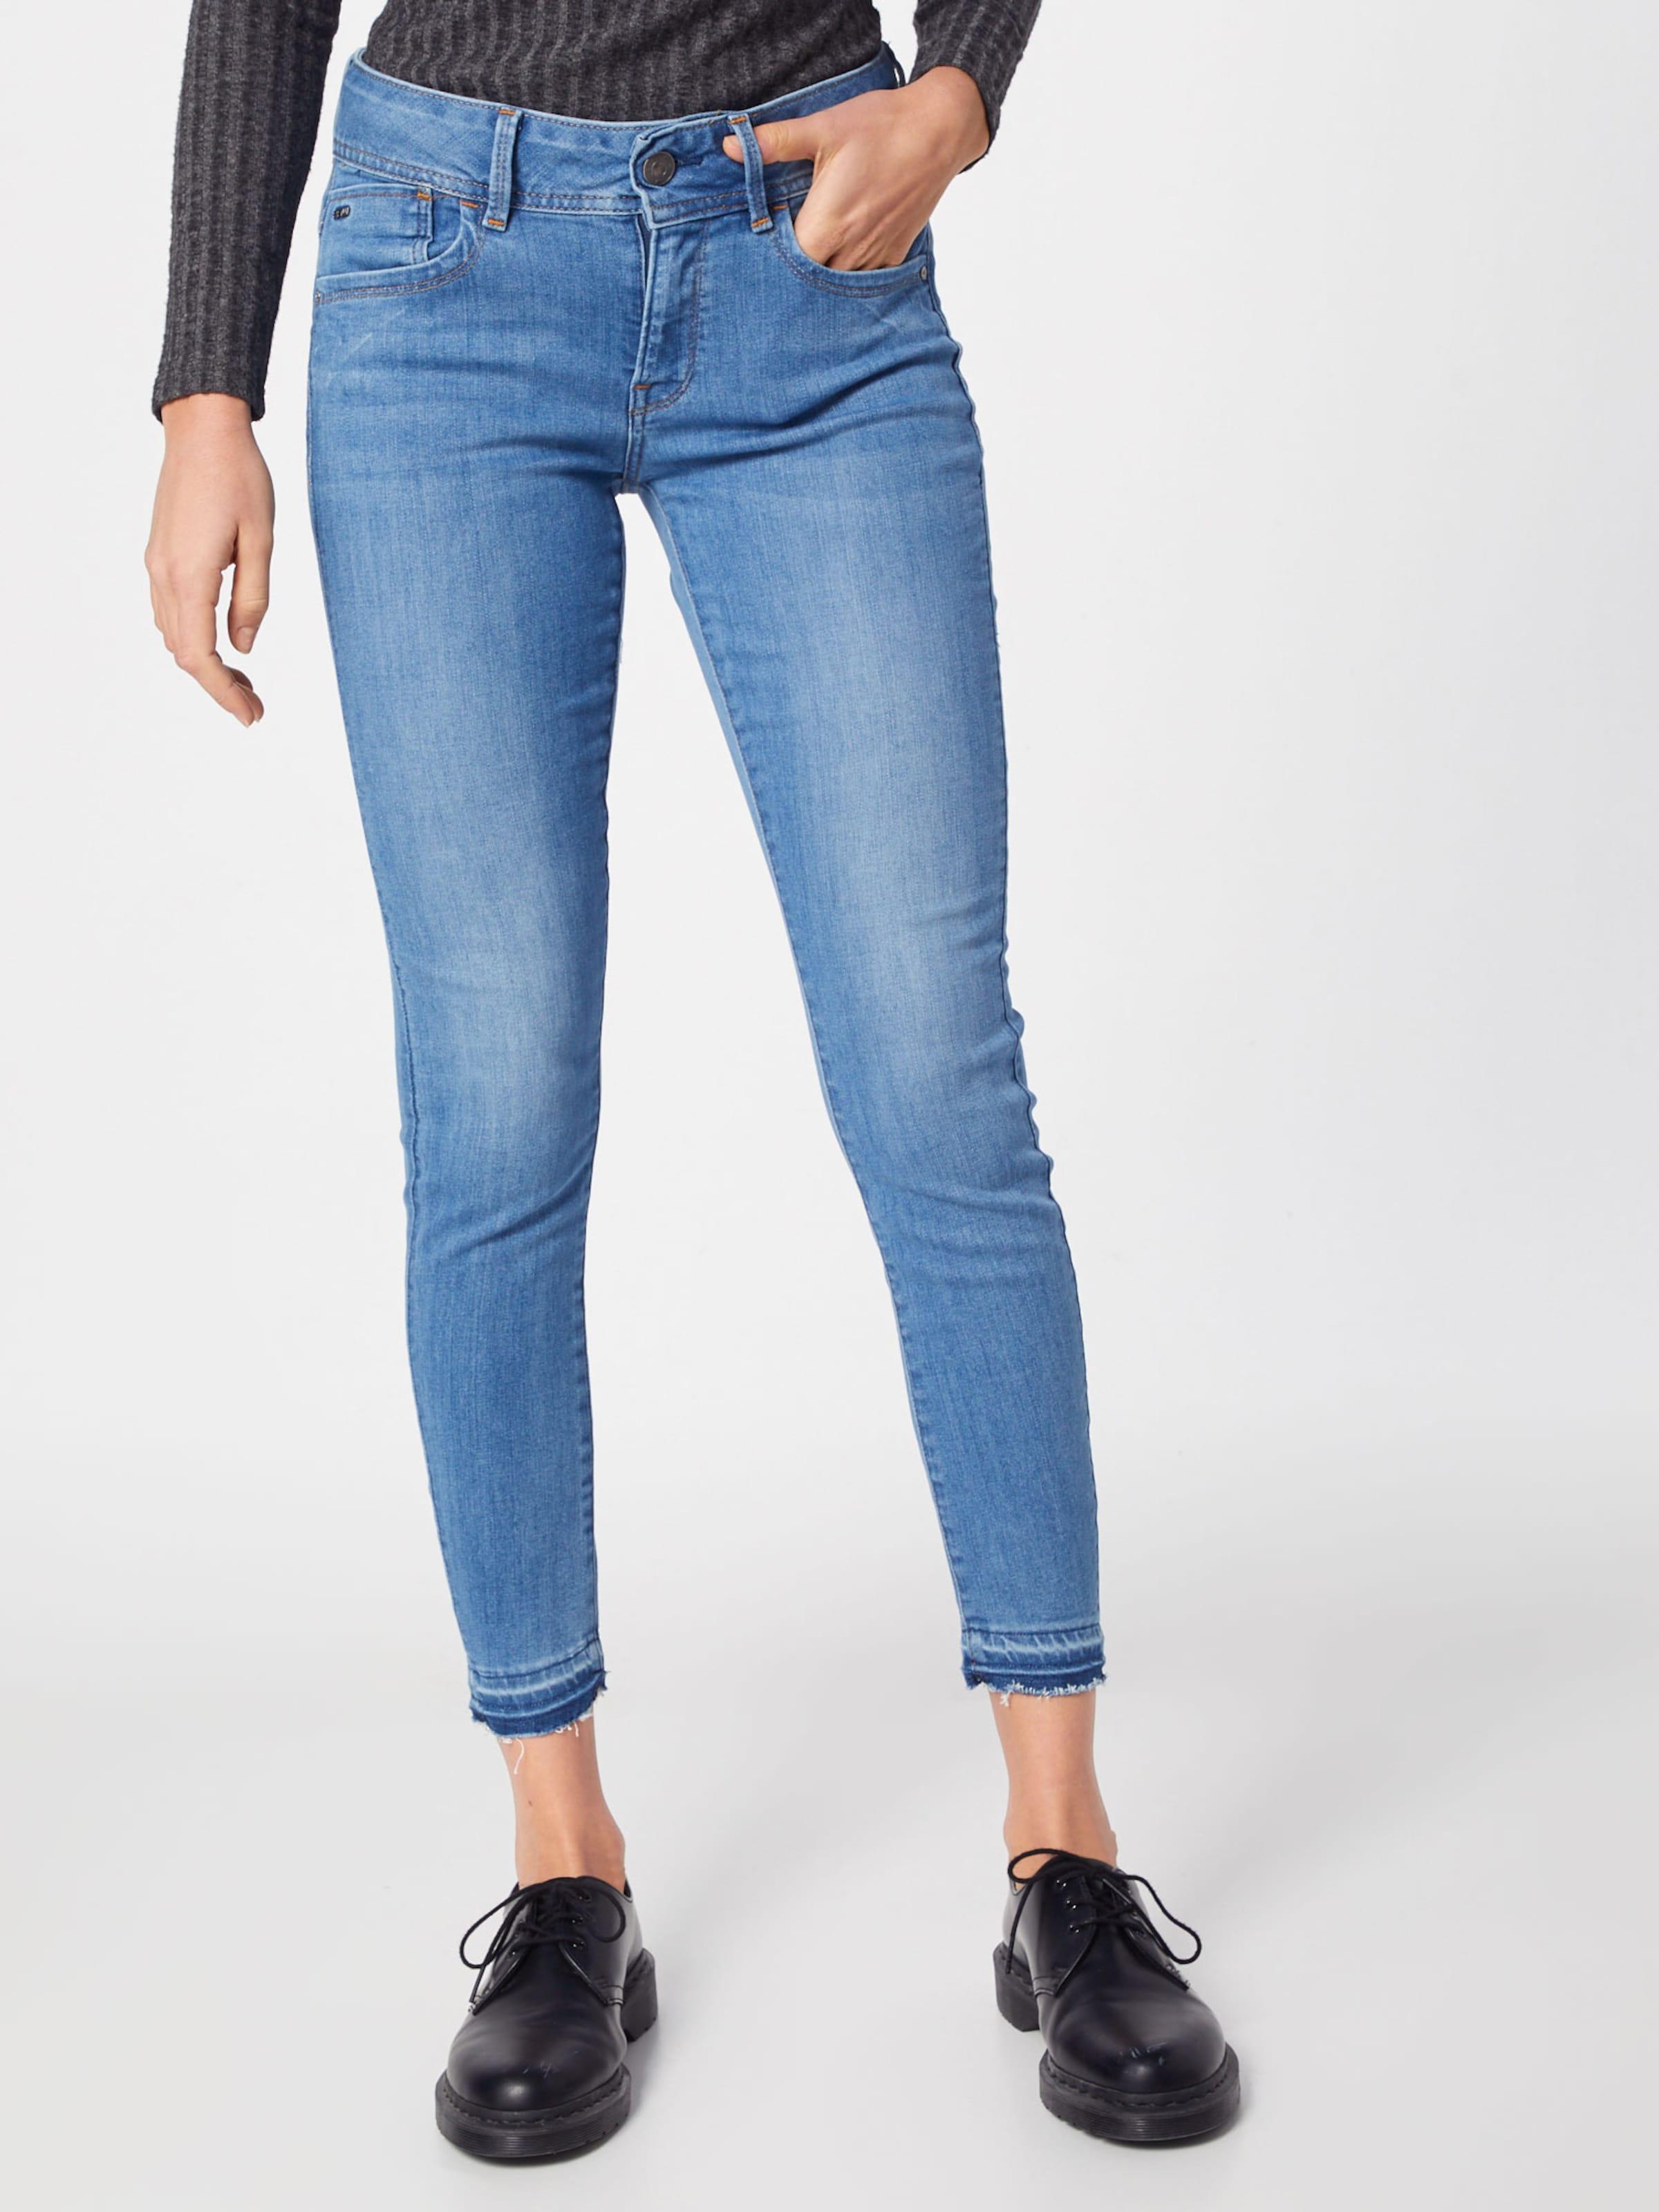 In star Denim G Blue Jeans 'lynn' Raw 3LARqj54